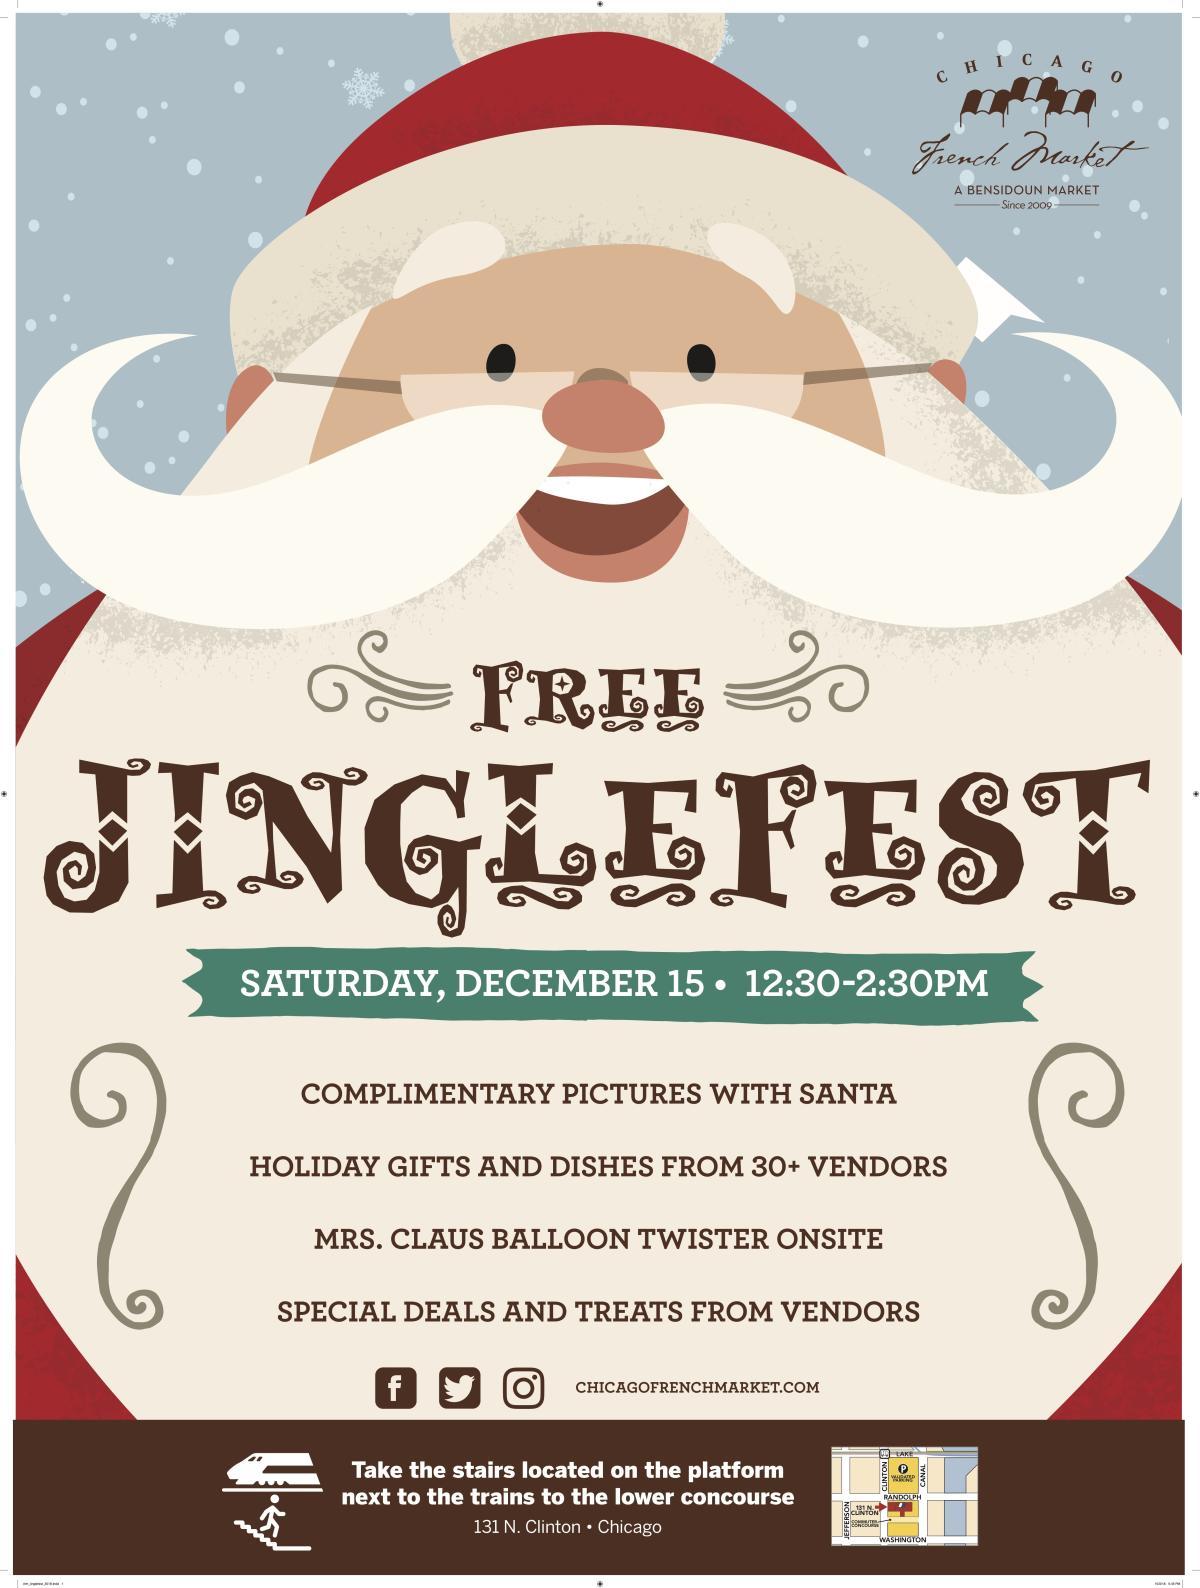 Chicago French Market hosts Jinglefest